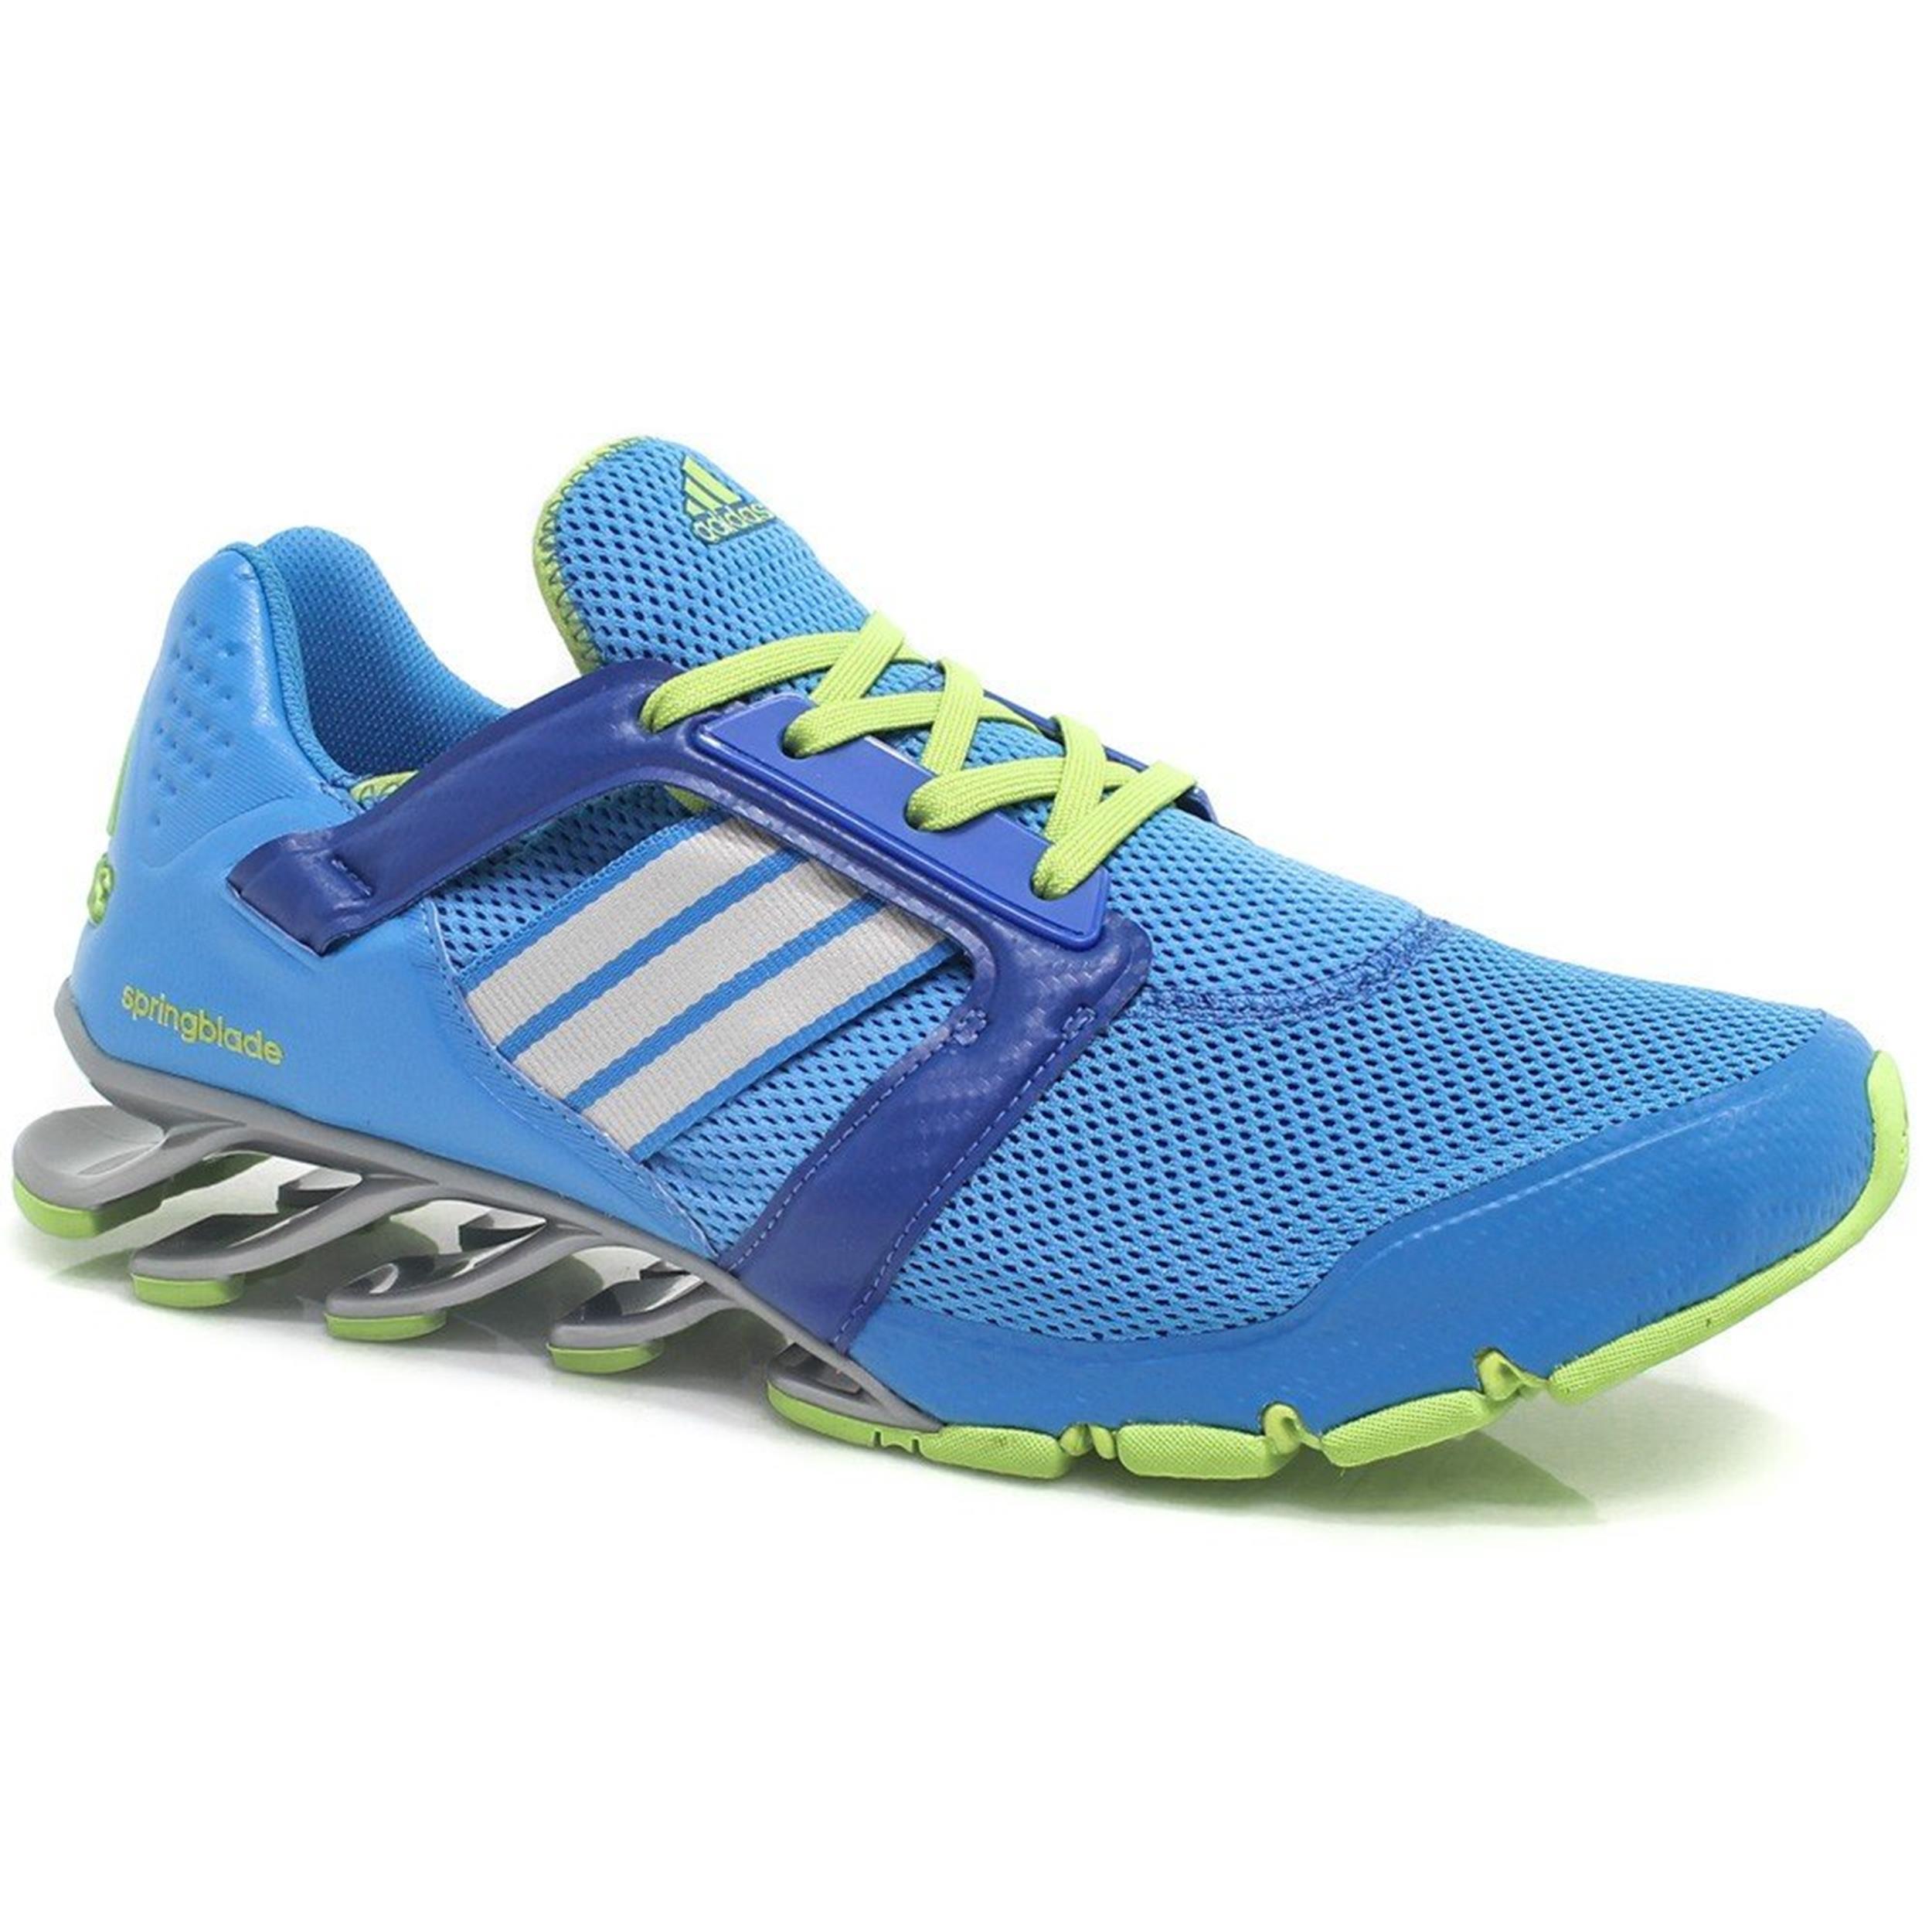 9af45bc81b Tênis Adidas Springblade E-force Running